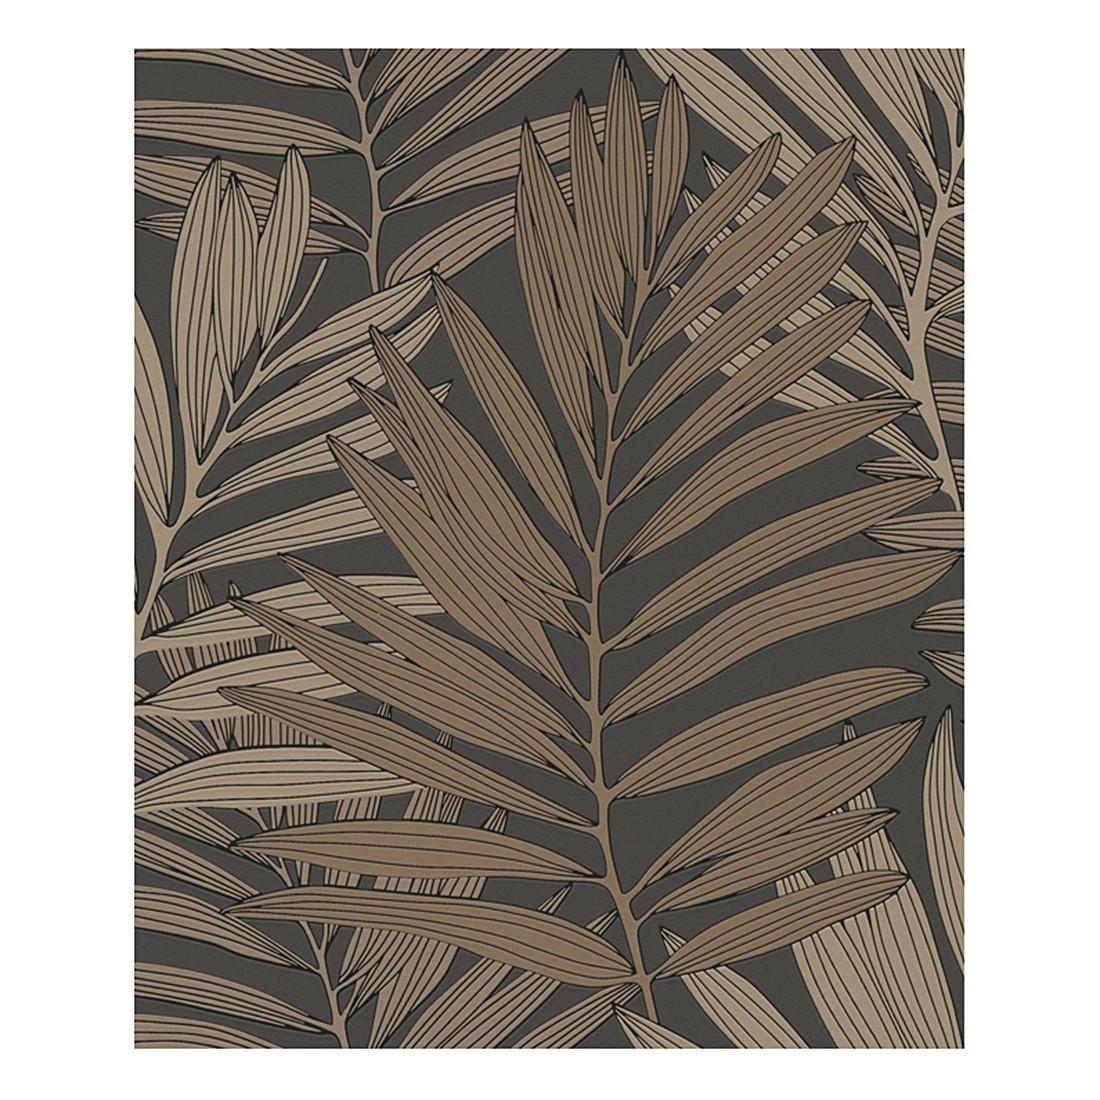 Vliestapete Palm Springs – graubraun, blassbraun, beige – strukturiert, Metropolis by Michalsky Living jetzt kaufen